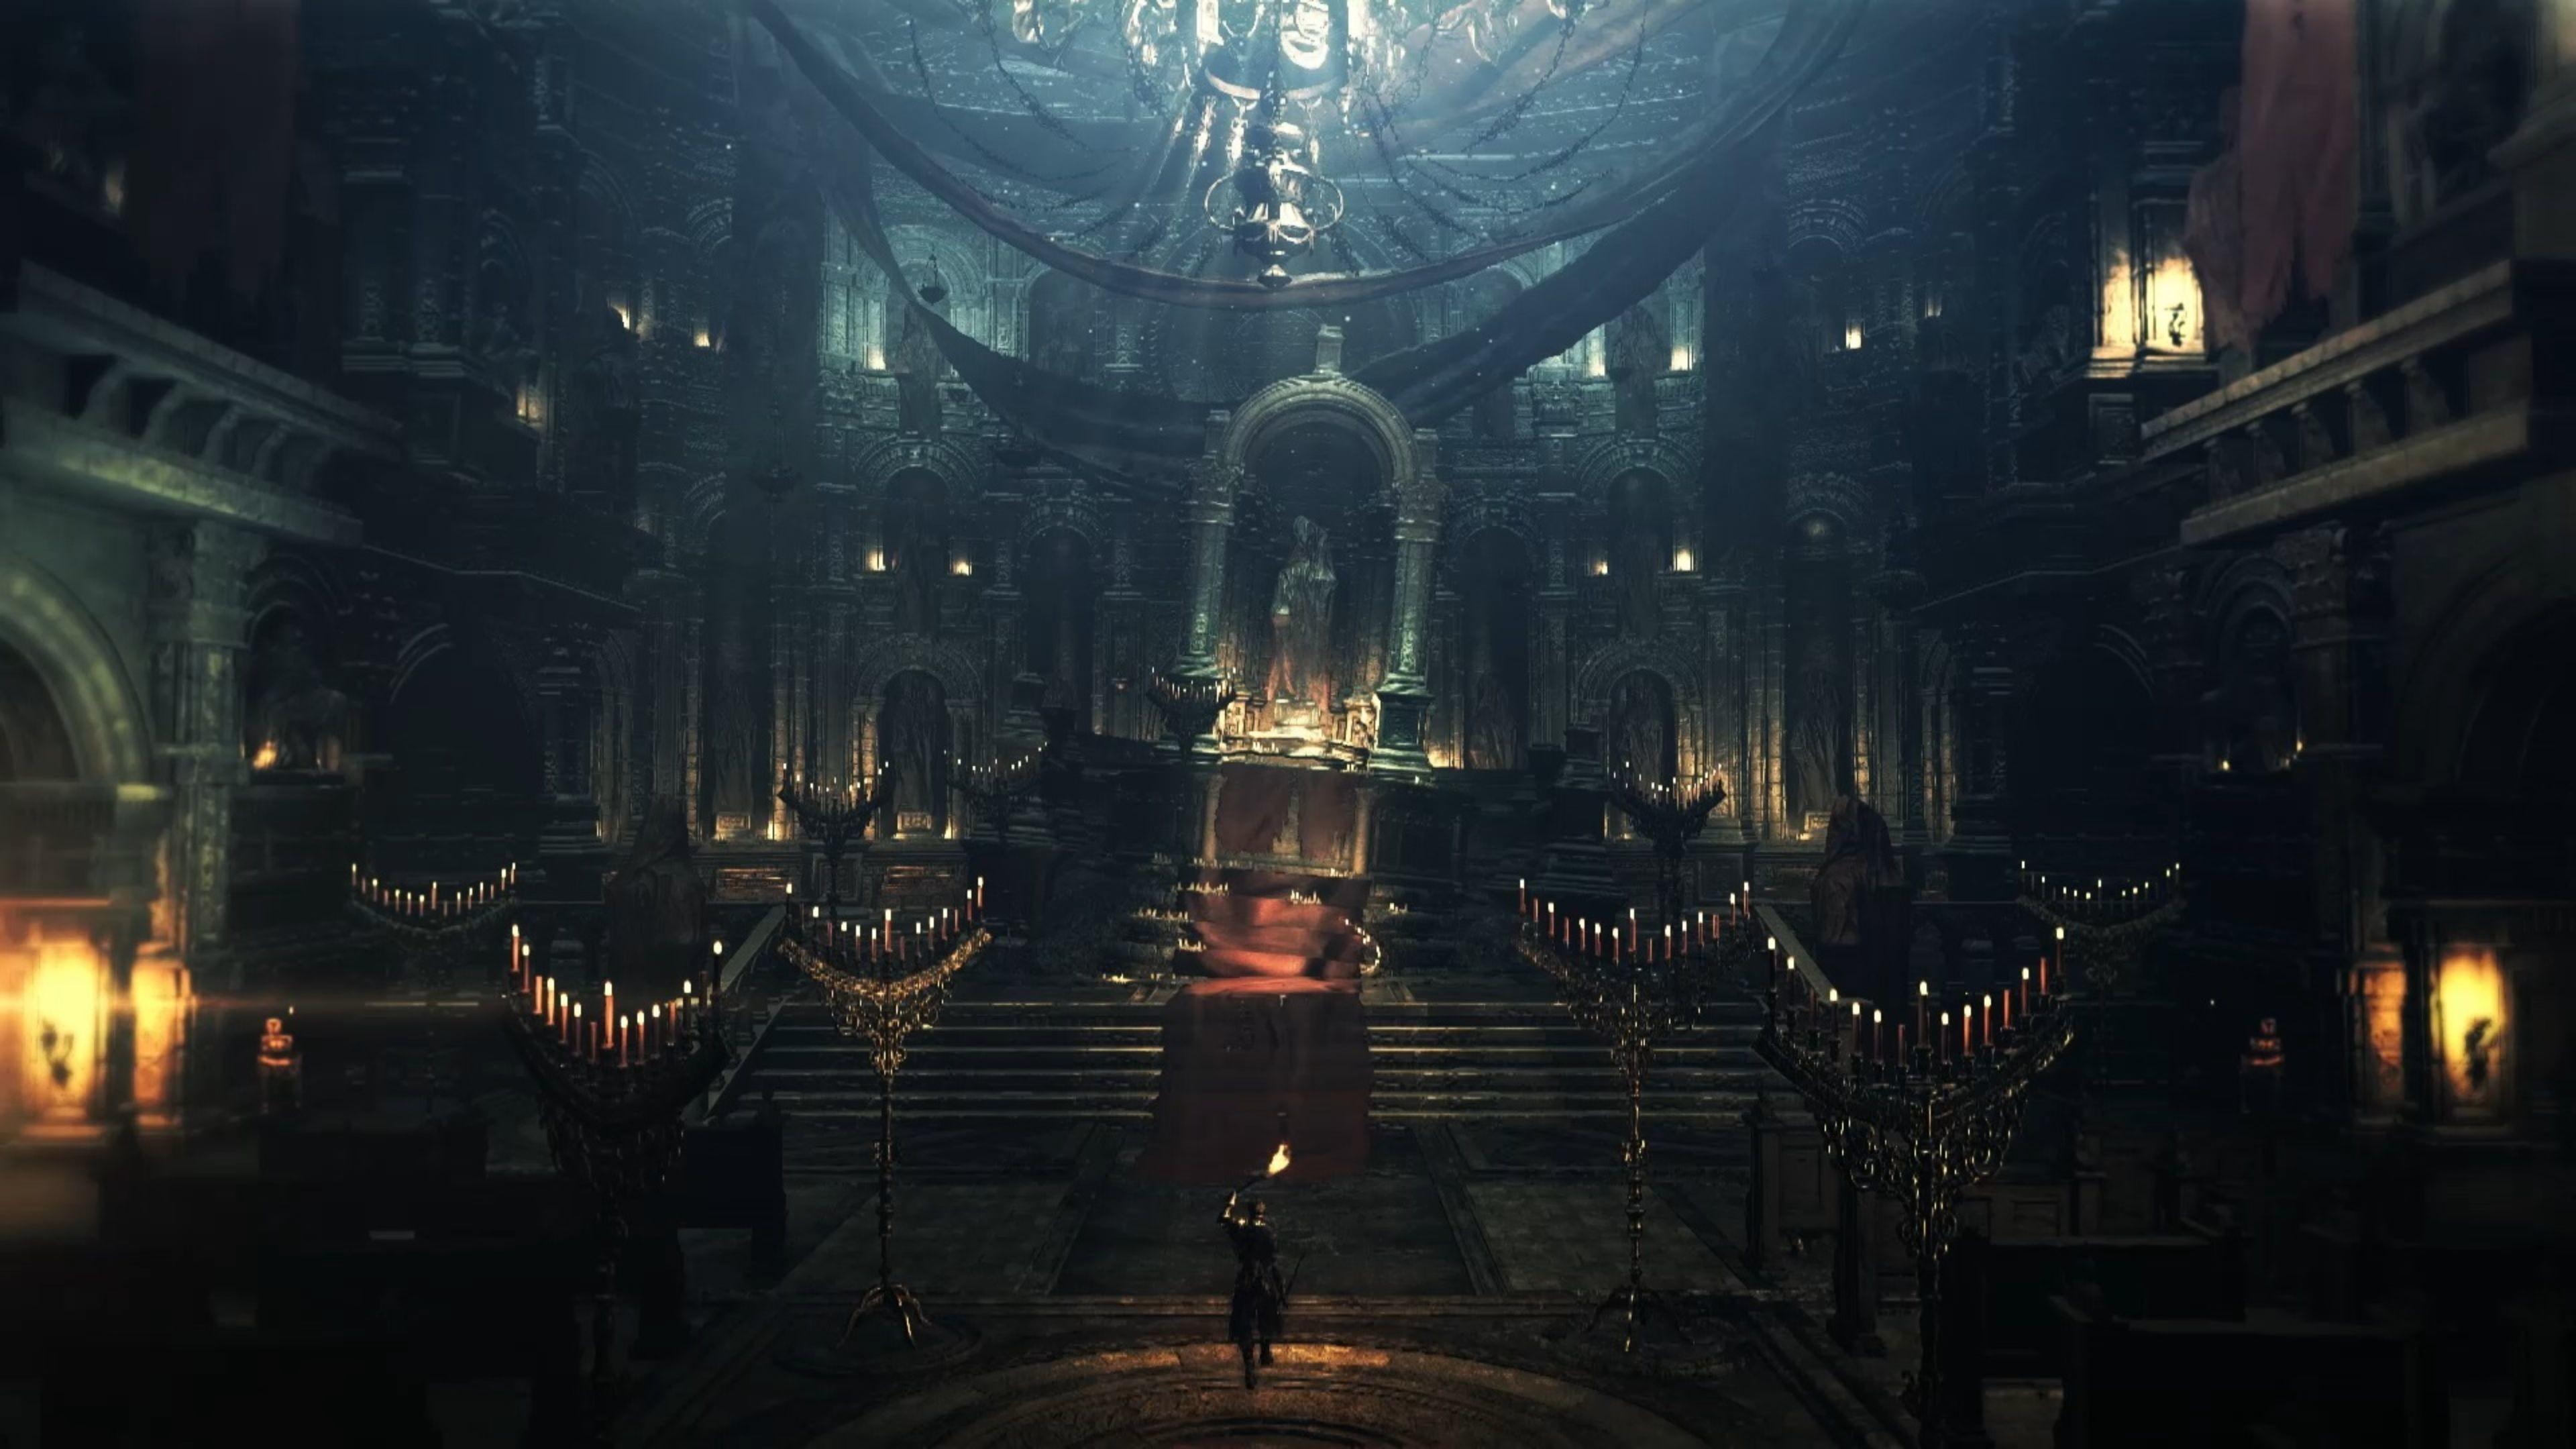 Dark Souls 3 Backgrounds Dark Souls 3 Wallpaper